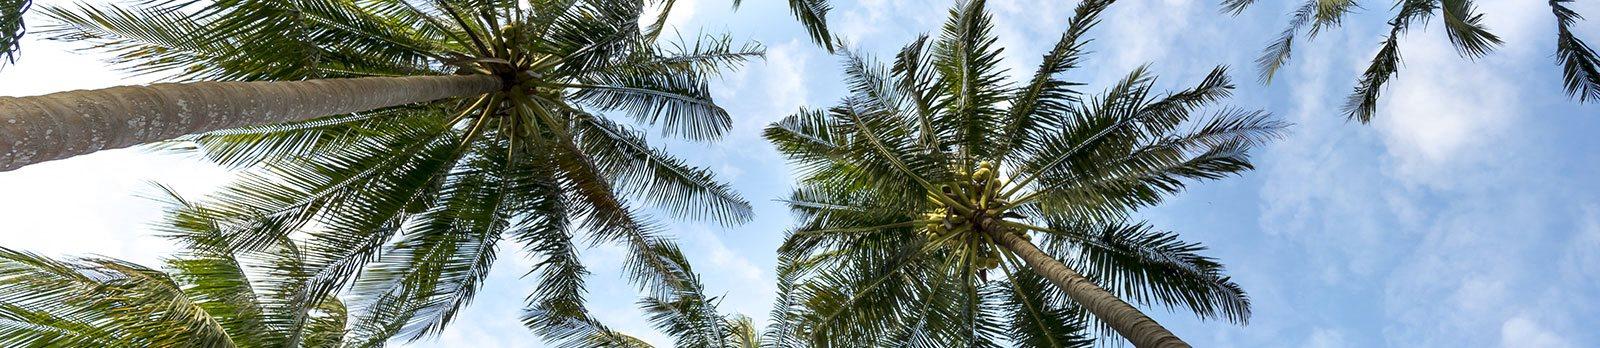 Palm Trees_Brownsville Village I, Miami, FL 33142